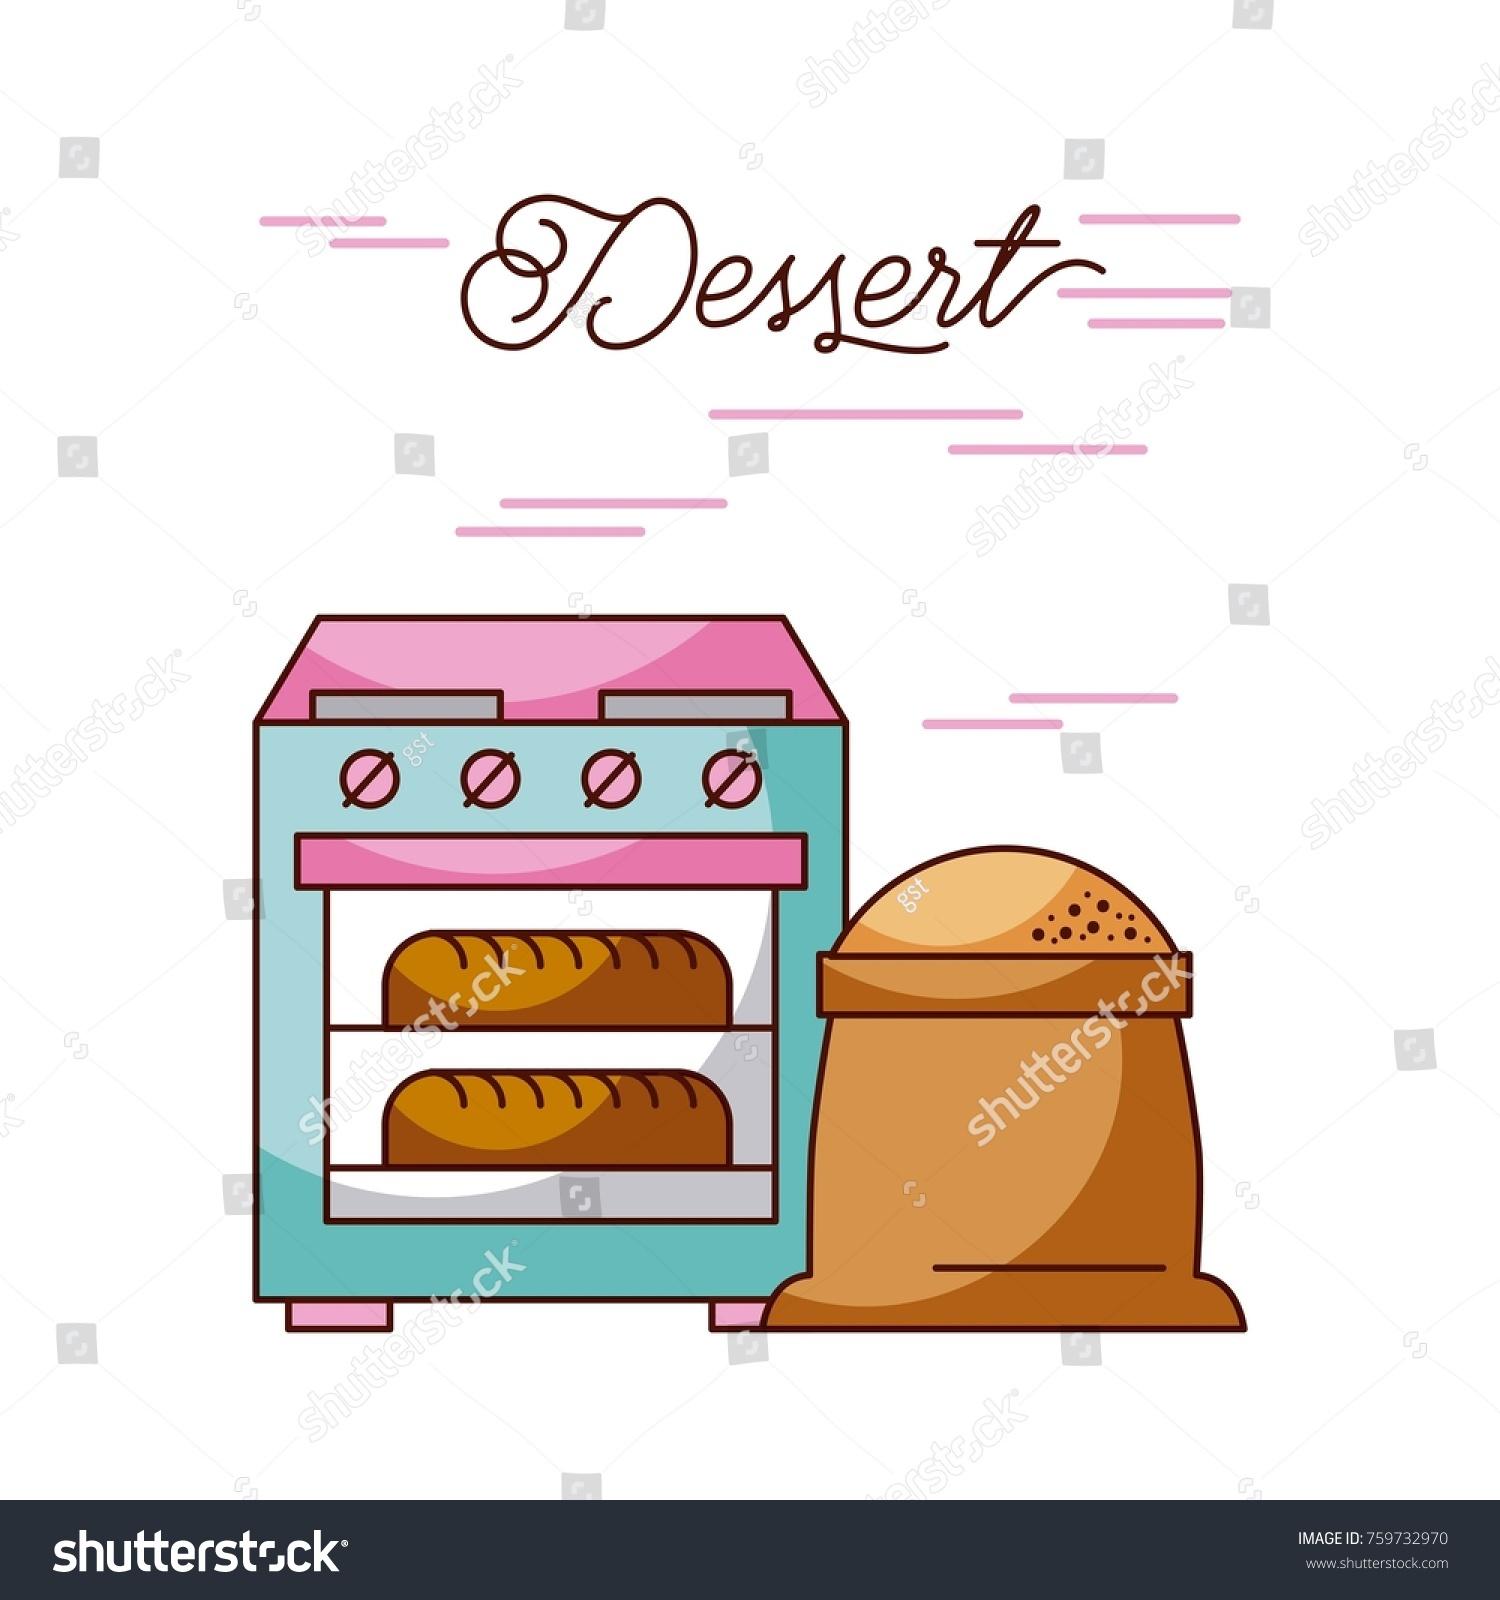 Bakery Stove Oven Two Hot Bread Stock Vector 759732970 - Shutterstock